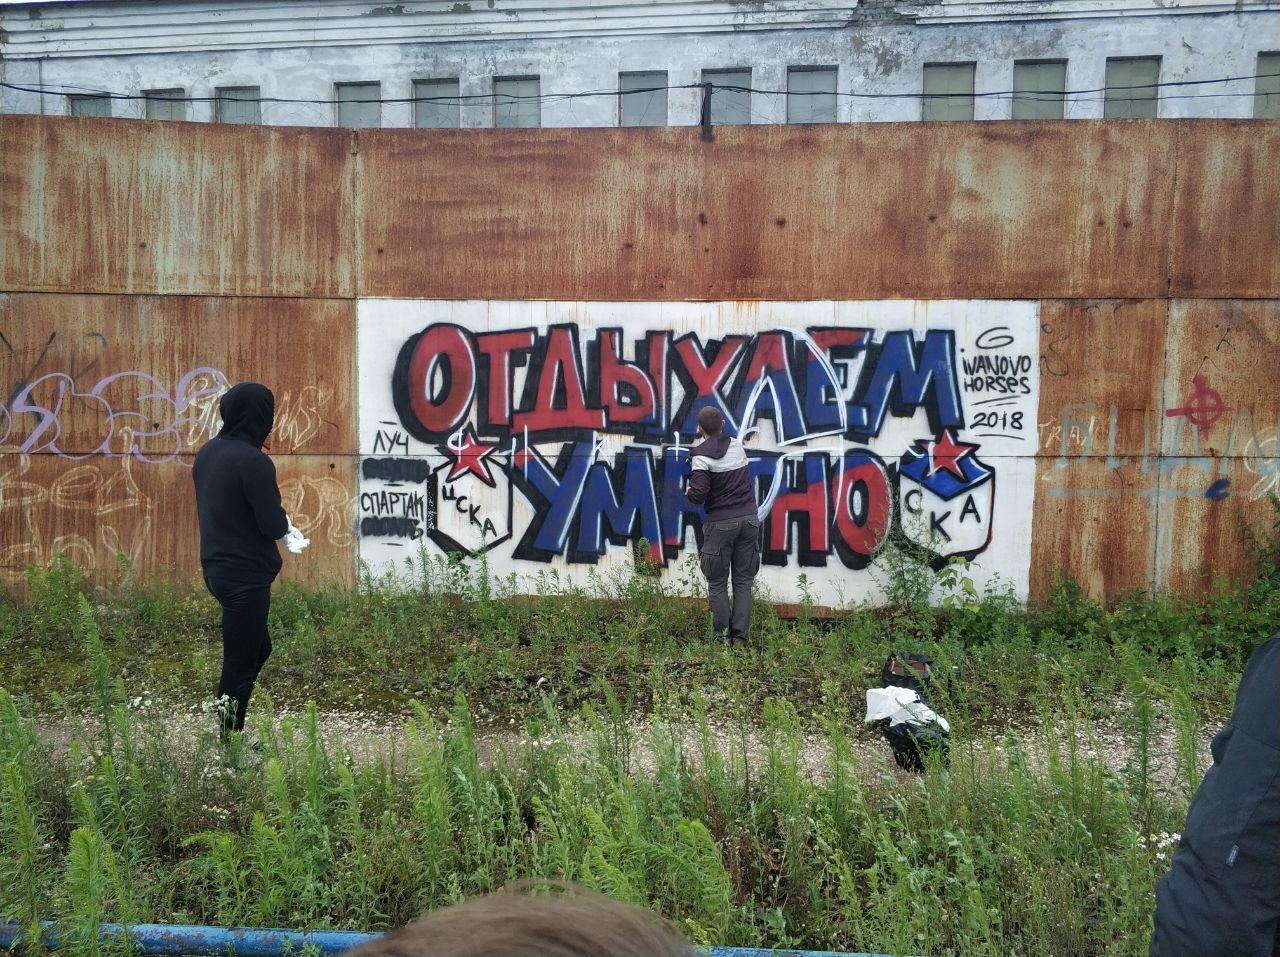 Граффити вконтакте манчестер юнайтед